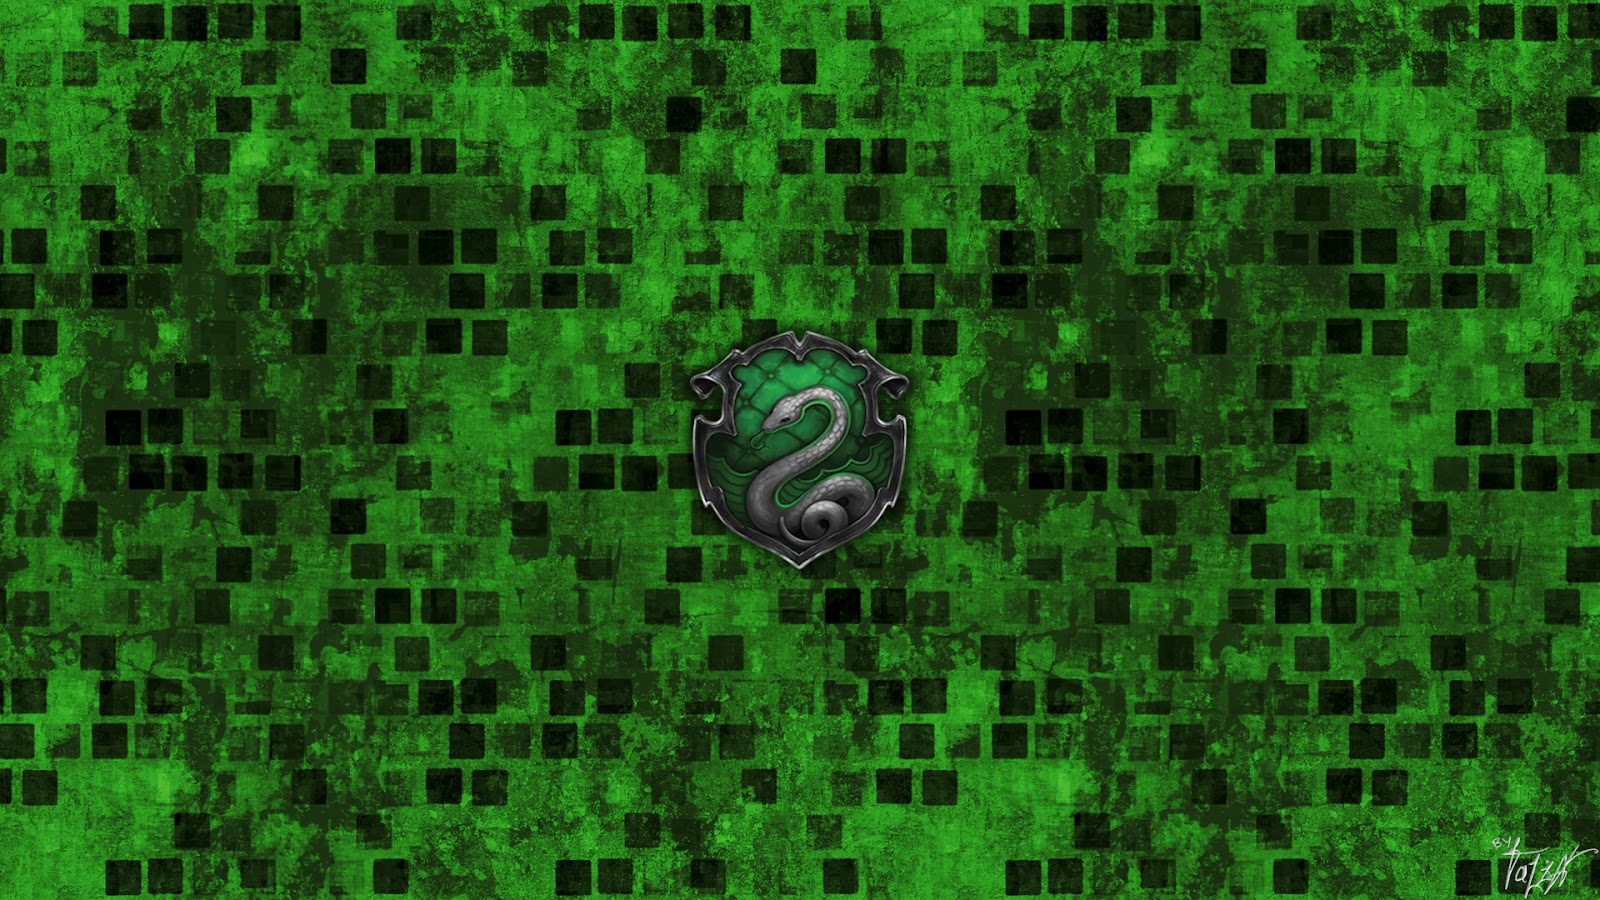 hogwarts house wallpaper   slytherin by theladyavatar d4olab9jpg 1600x900